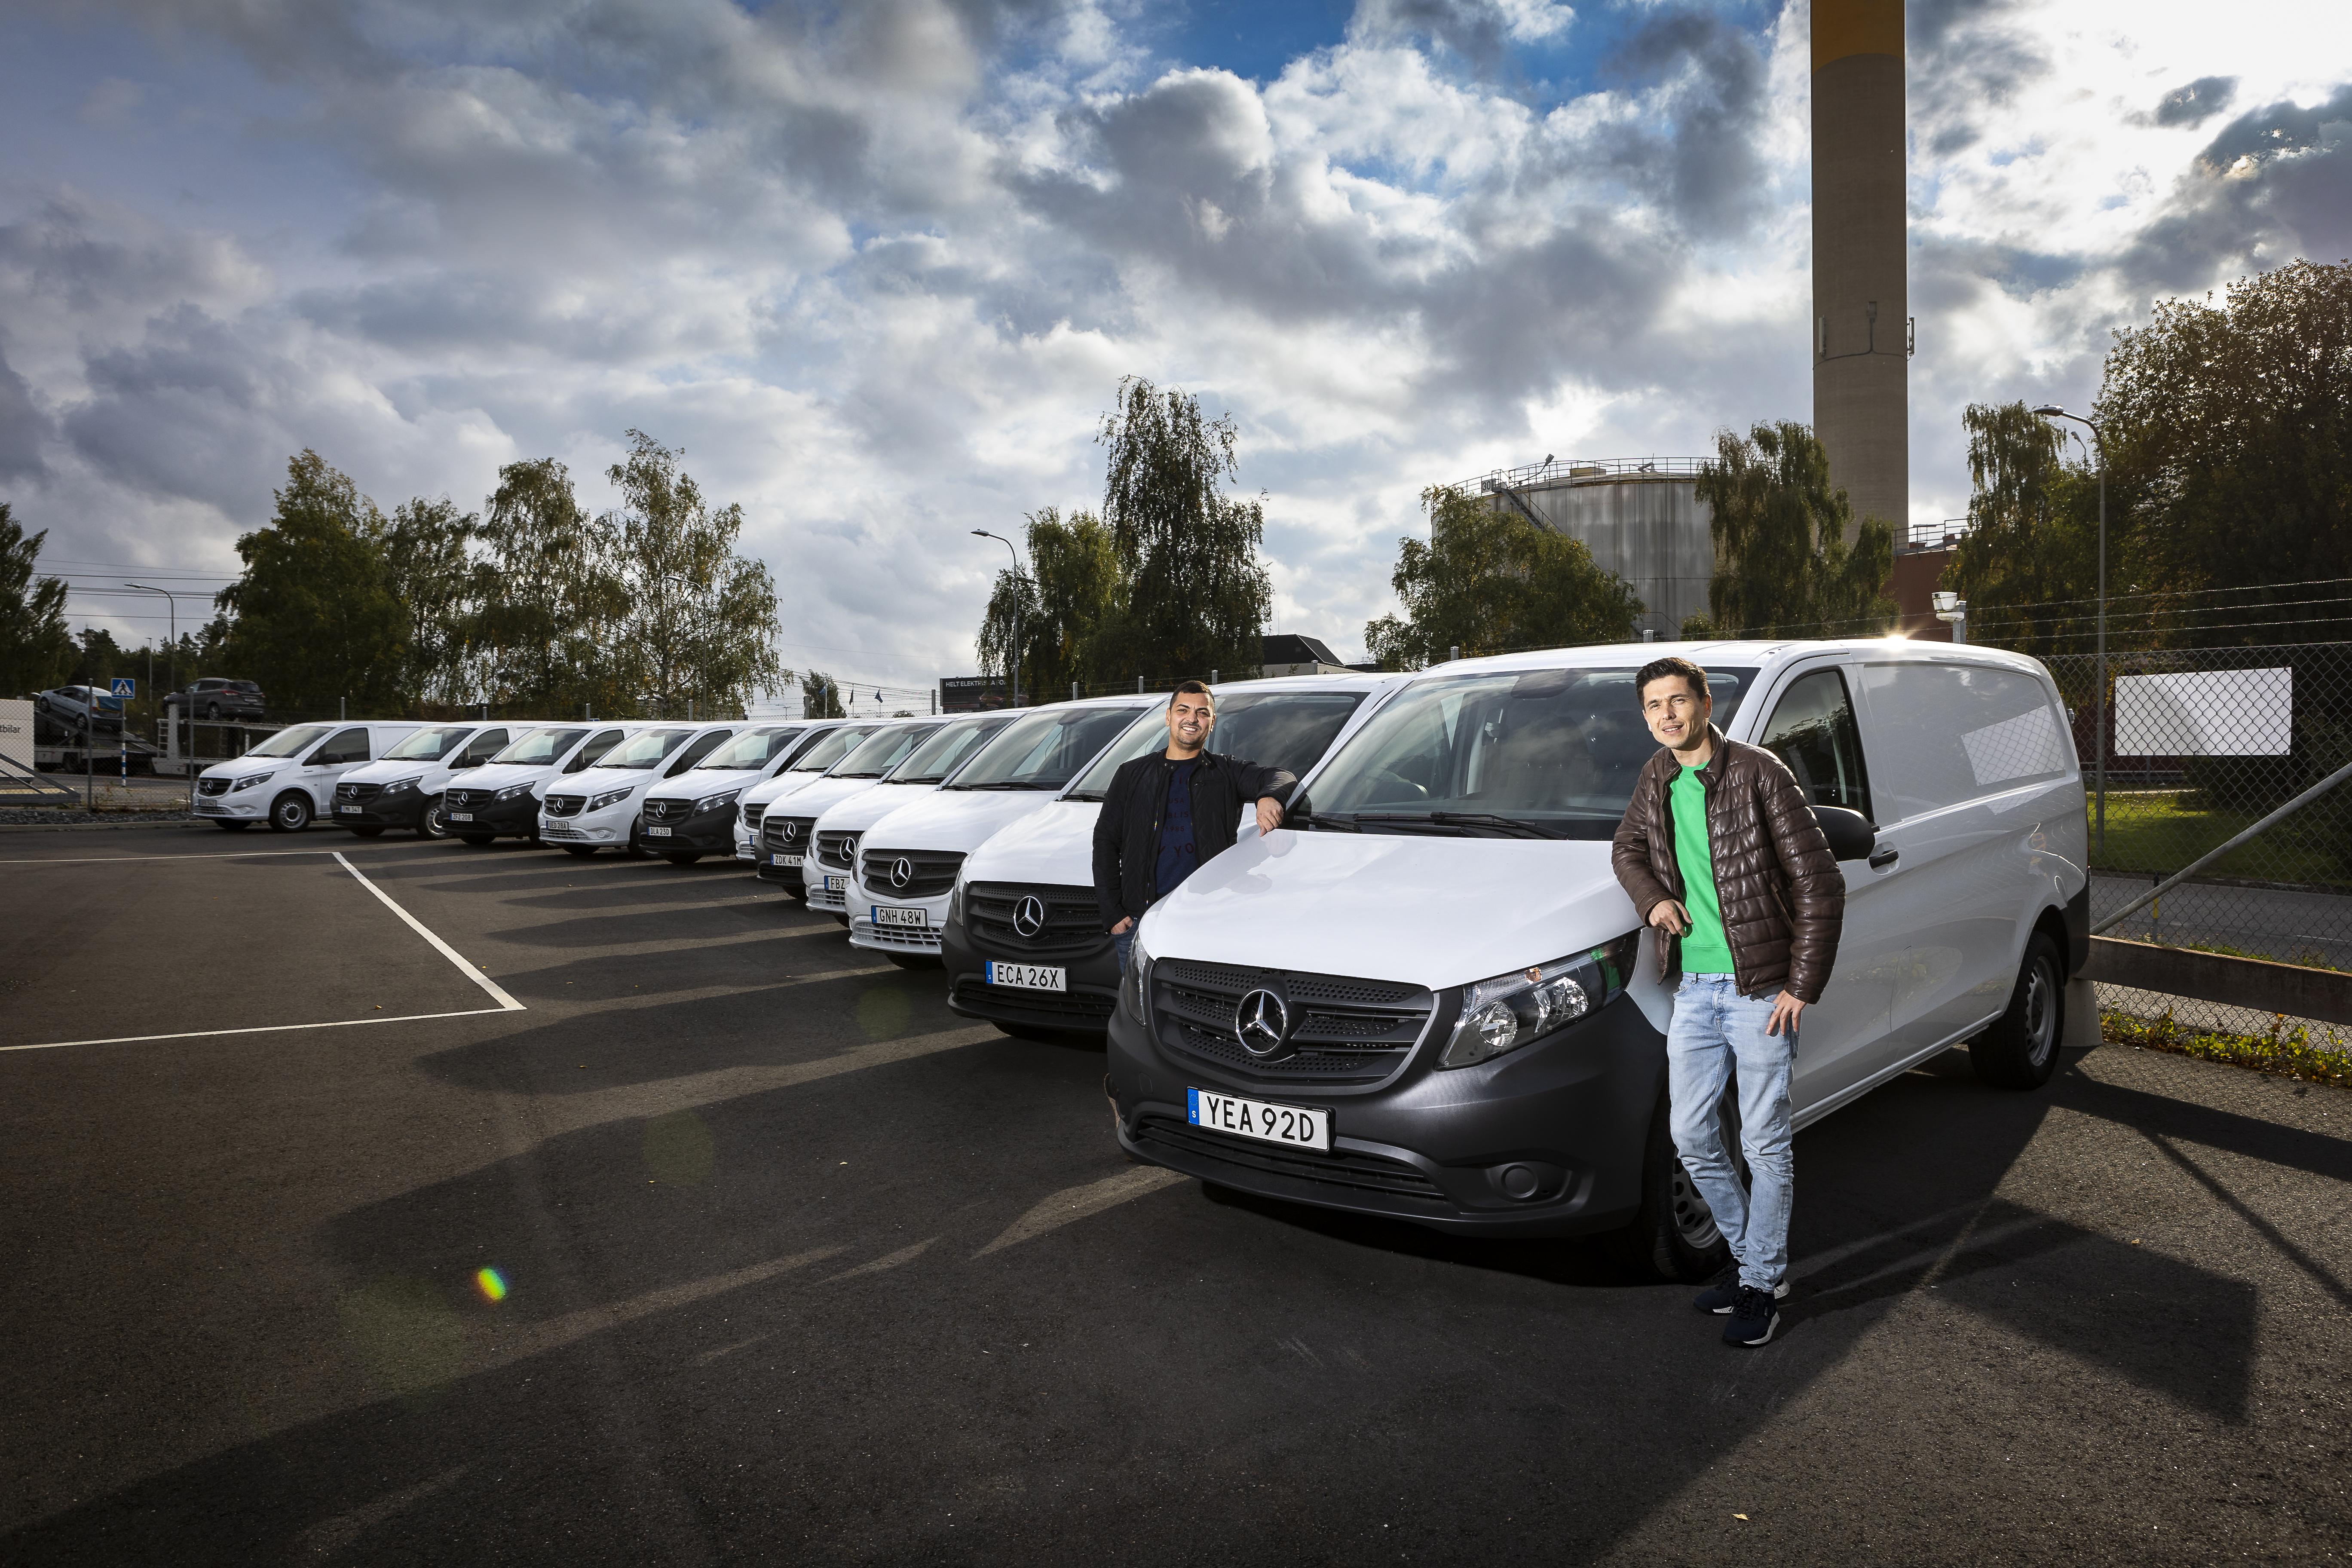 11 eldrivna Mercedes-Benz till snabbväxande budföretag